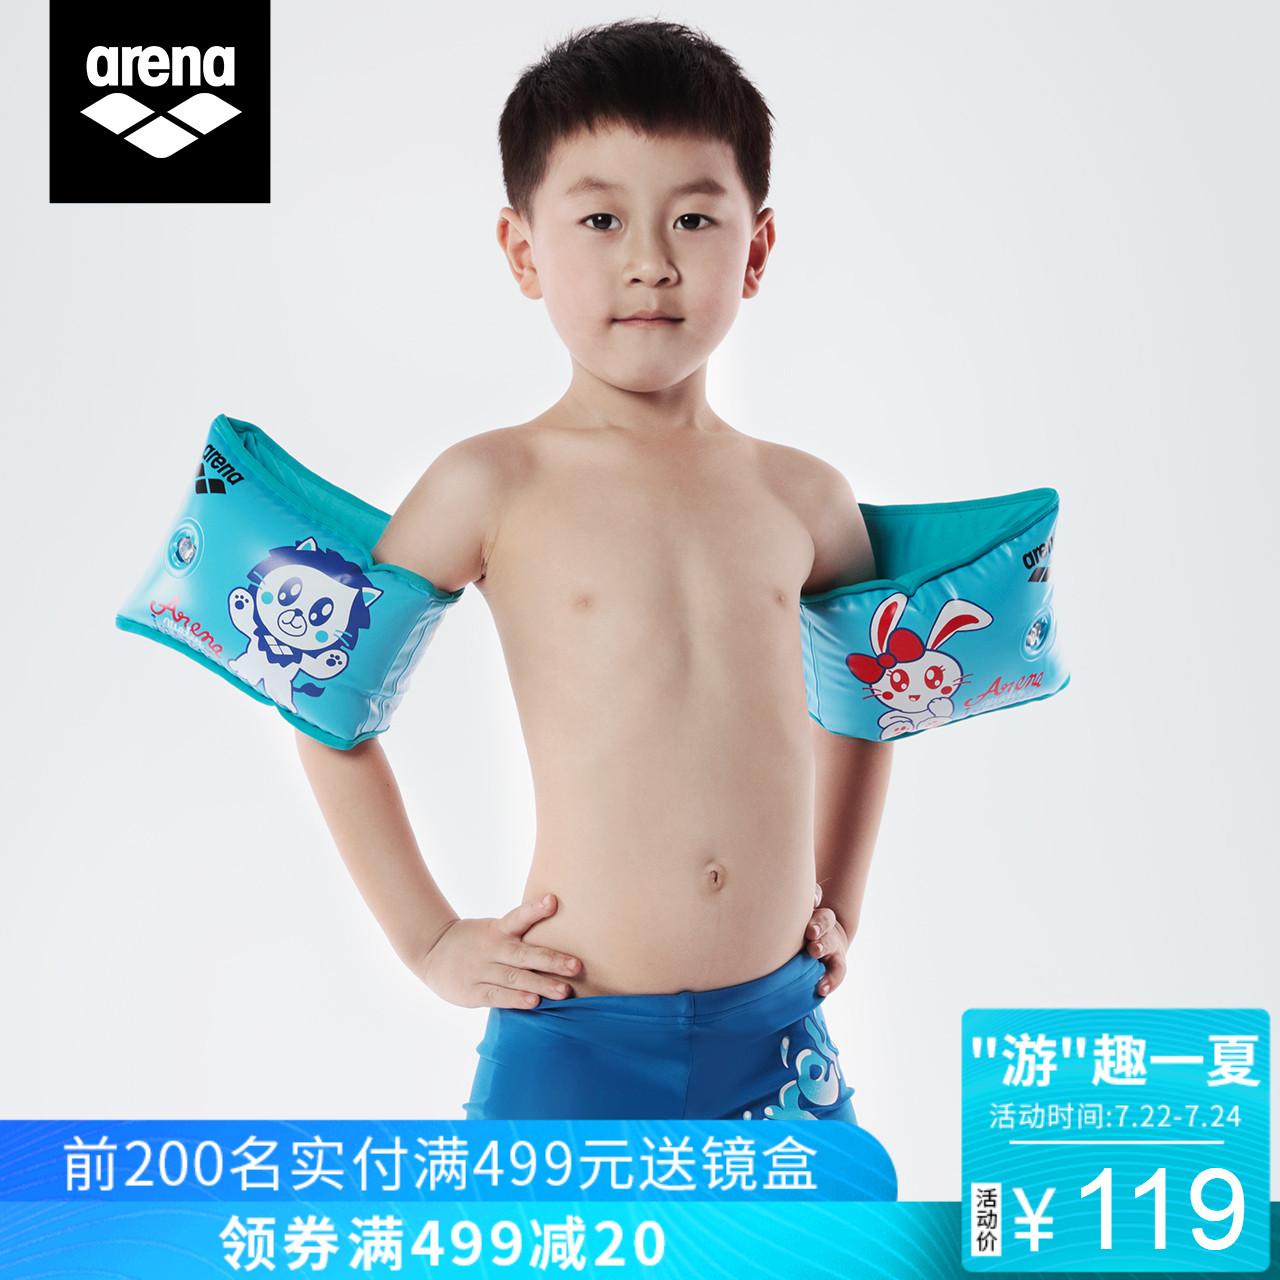 arena阿瑞娜水袖游泳臂圈防装备初学者儿童游泳溺水浮袖手臂圈